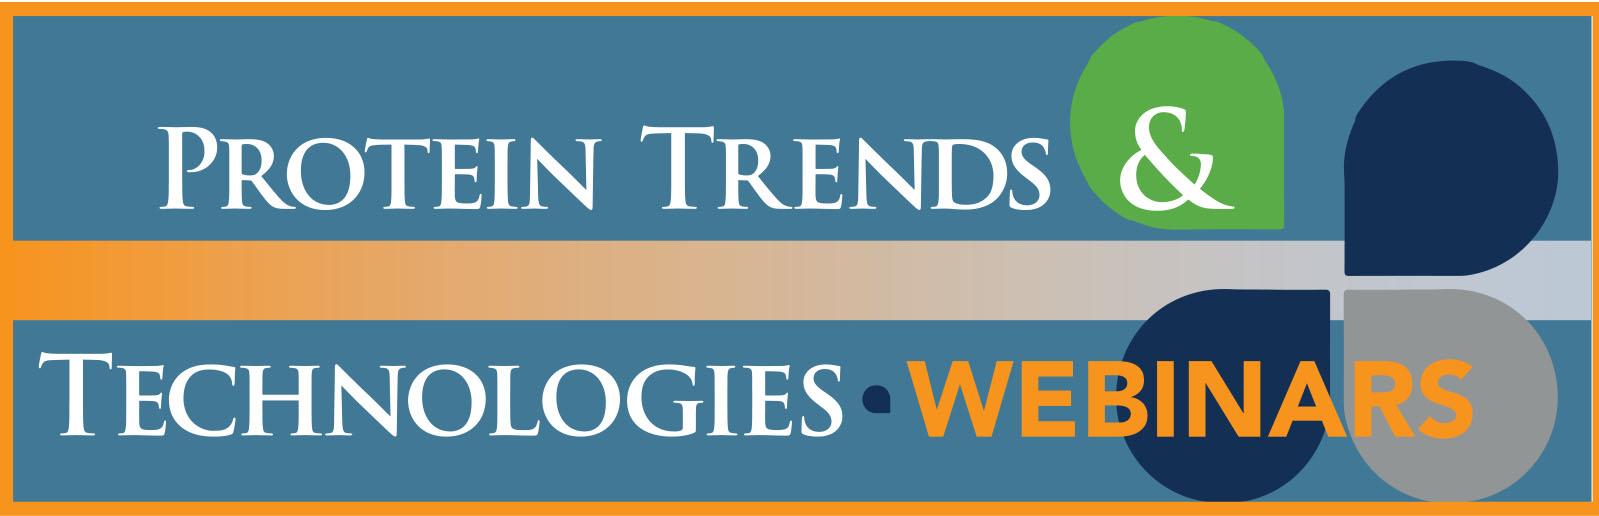 Protein Trends & Technologies Webinars Logo